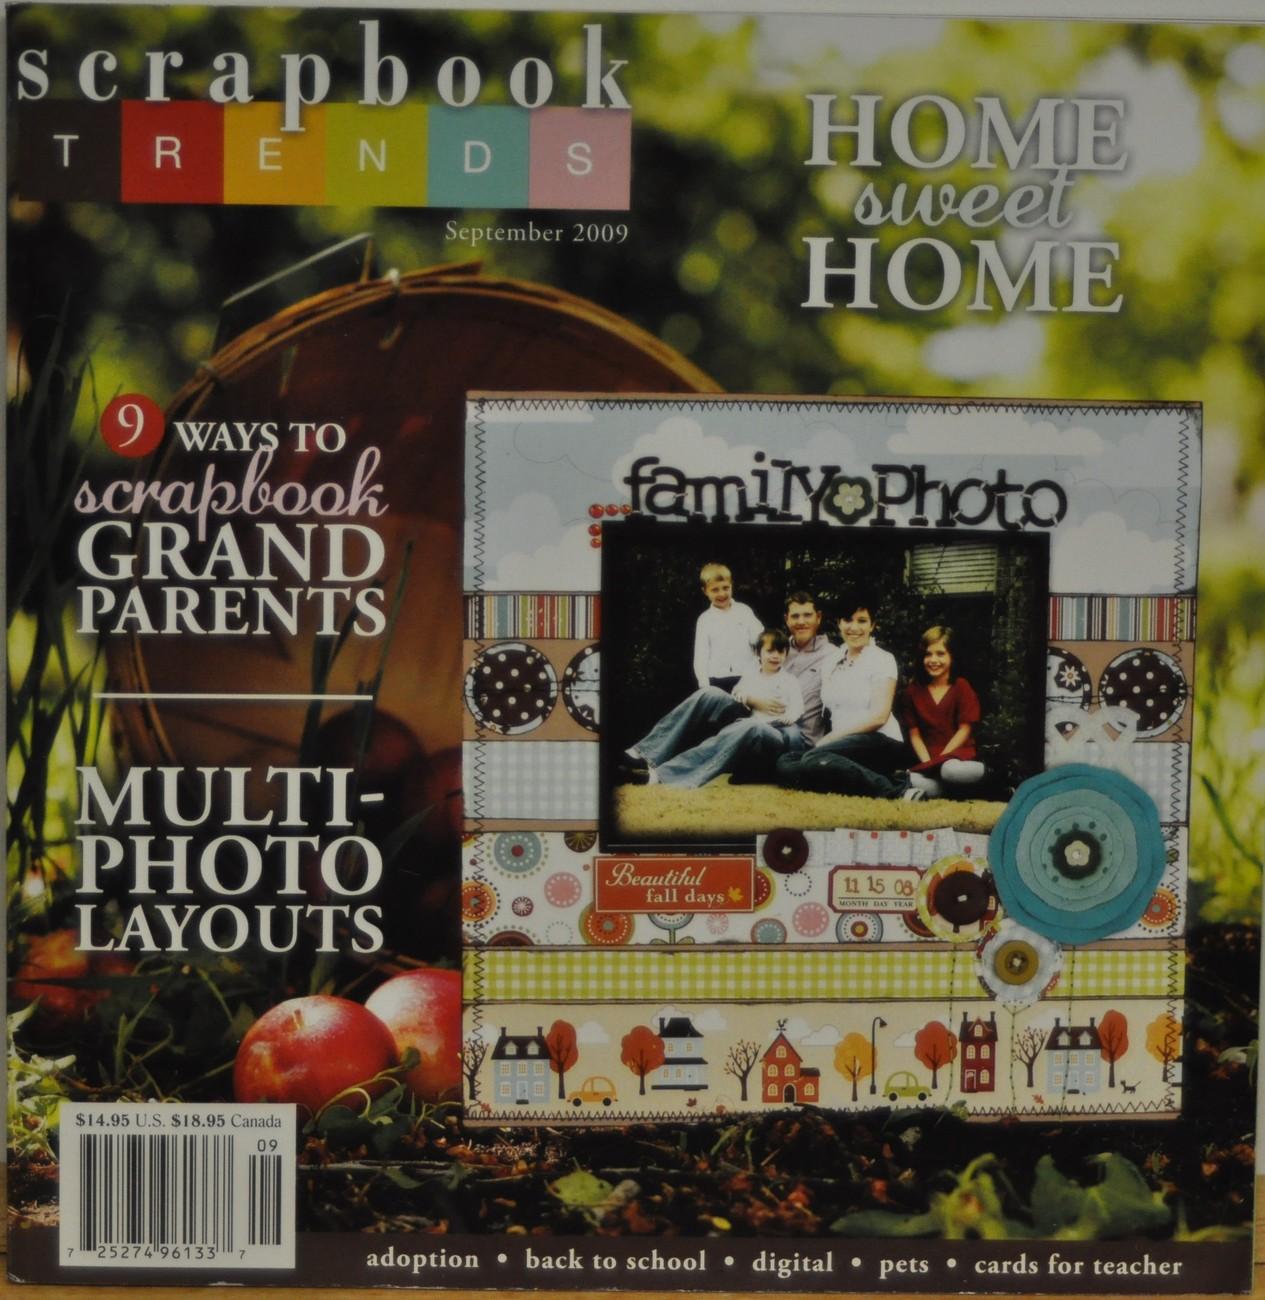 Scrapbook sept 09